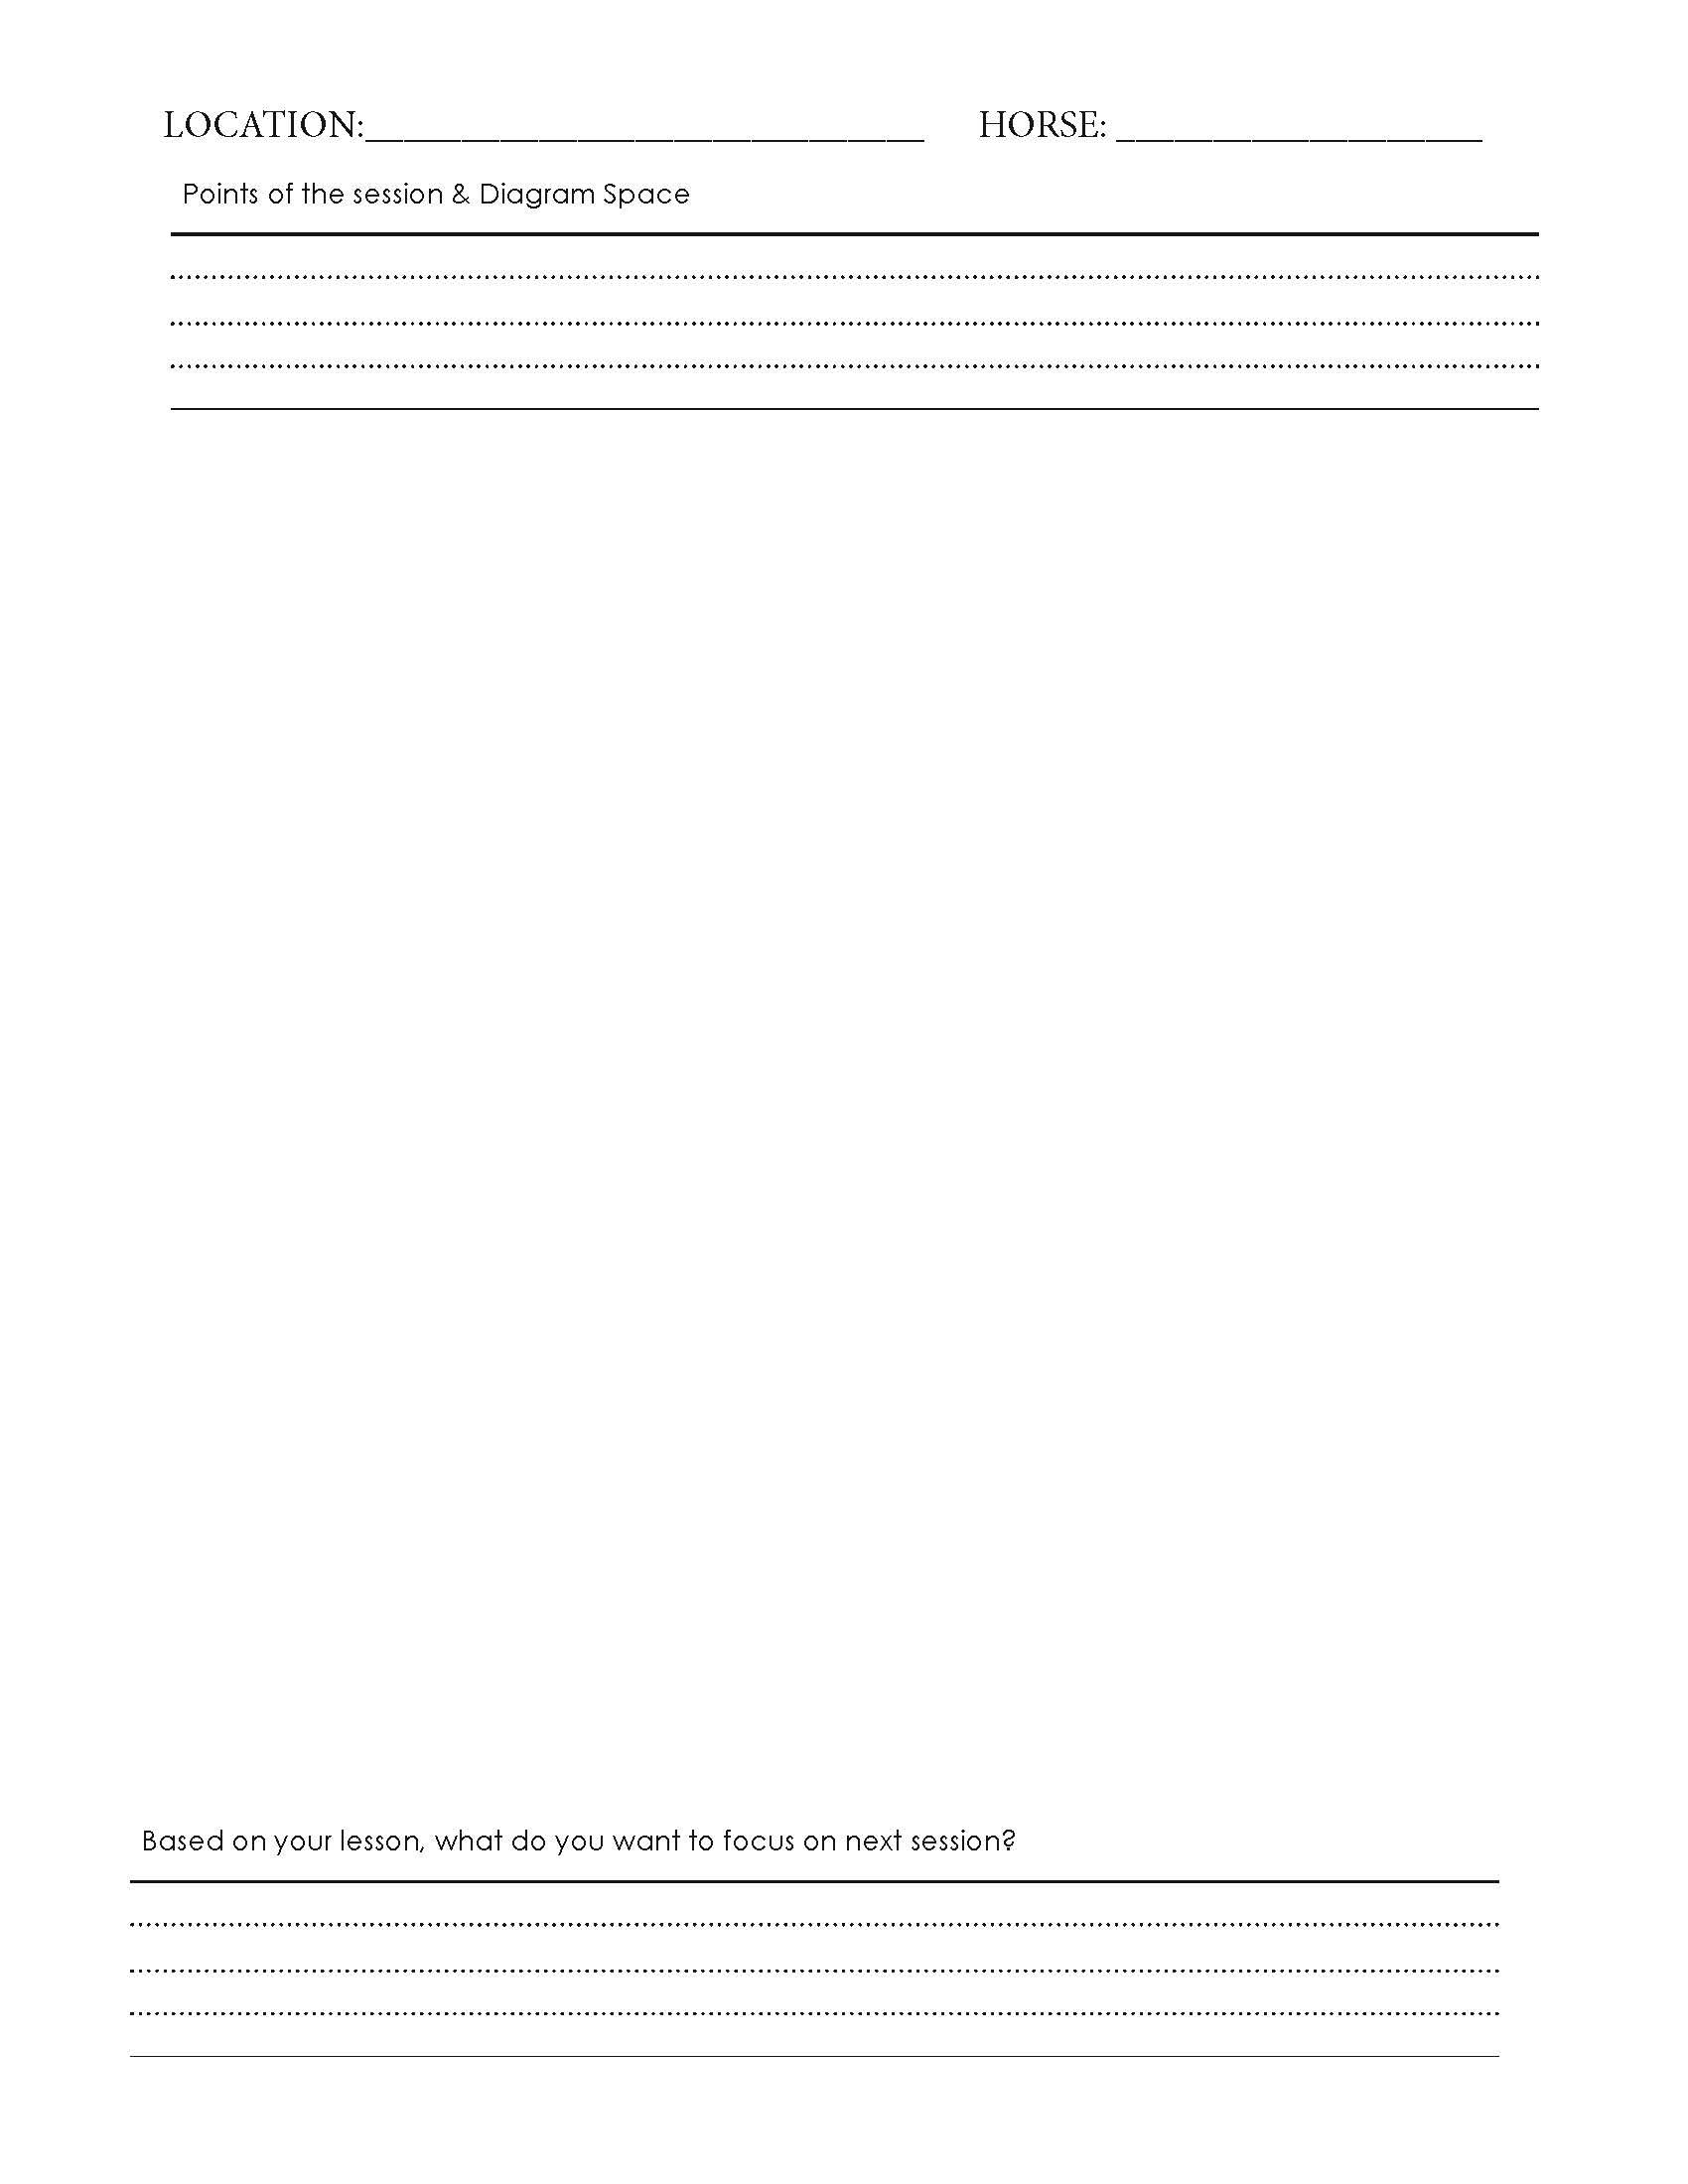 Lesson Page 2